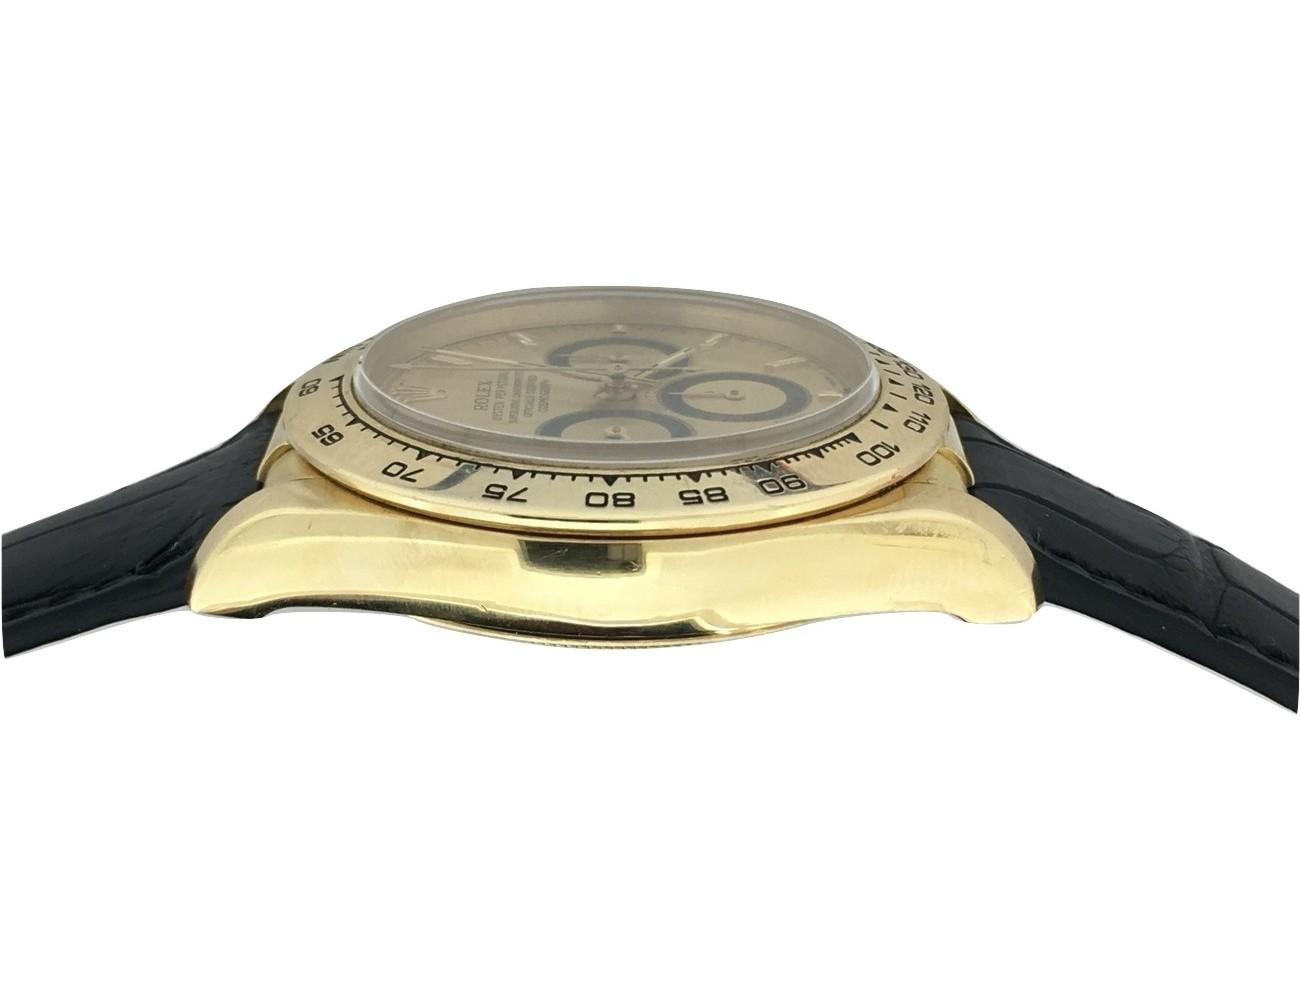 Montre occasion Rolex Daytona 16518 zénith.